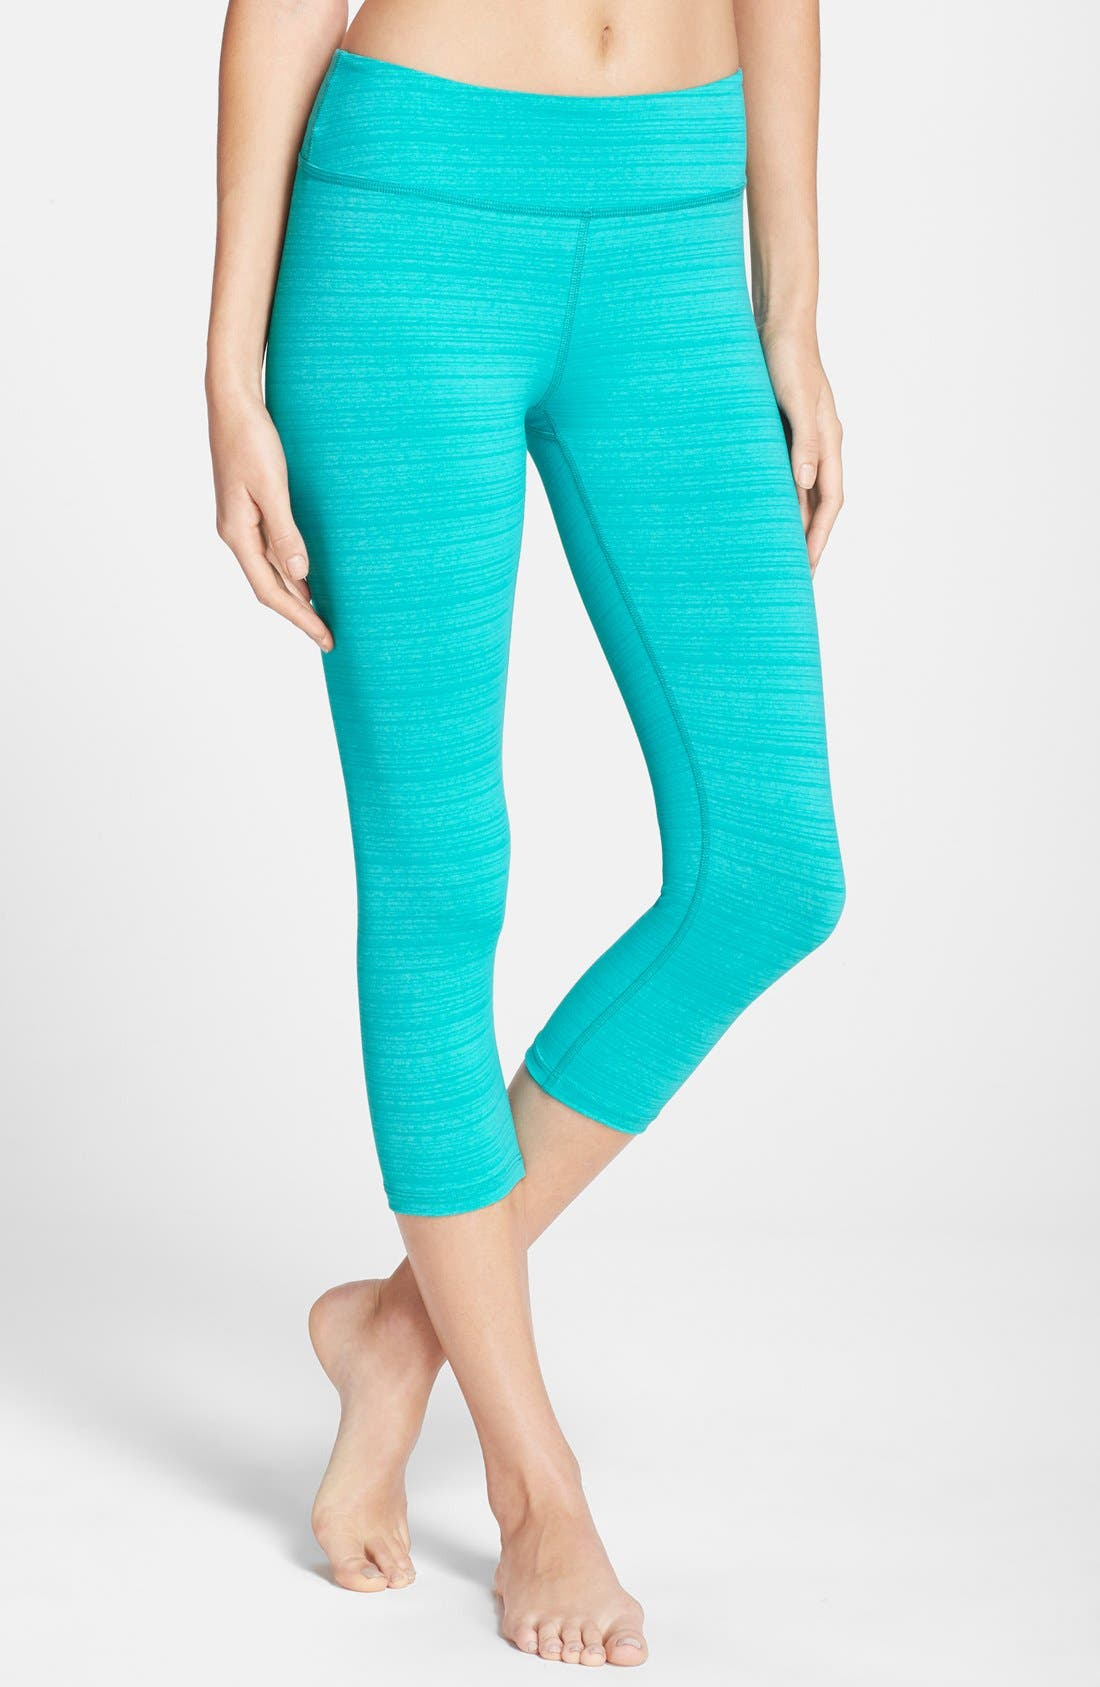 Alternate Image 1 Selected - Beyond Yoga 'Stripe-Hype' Capri Leggings